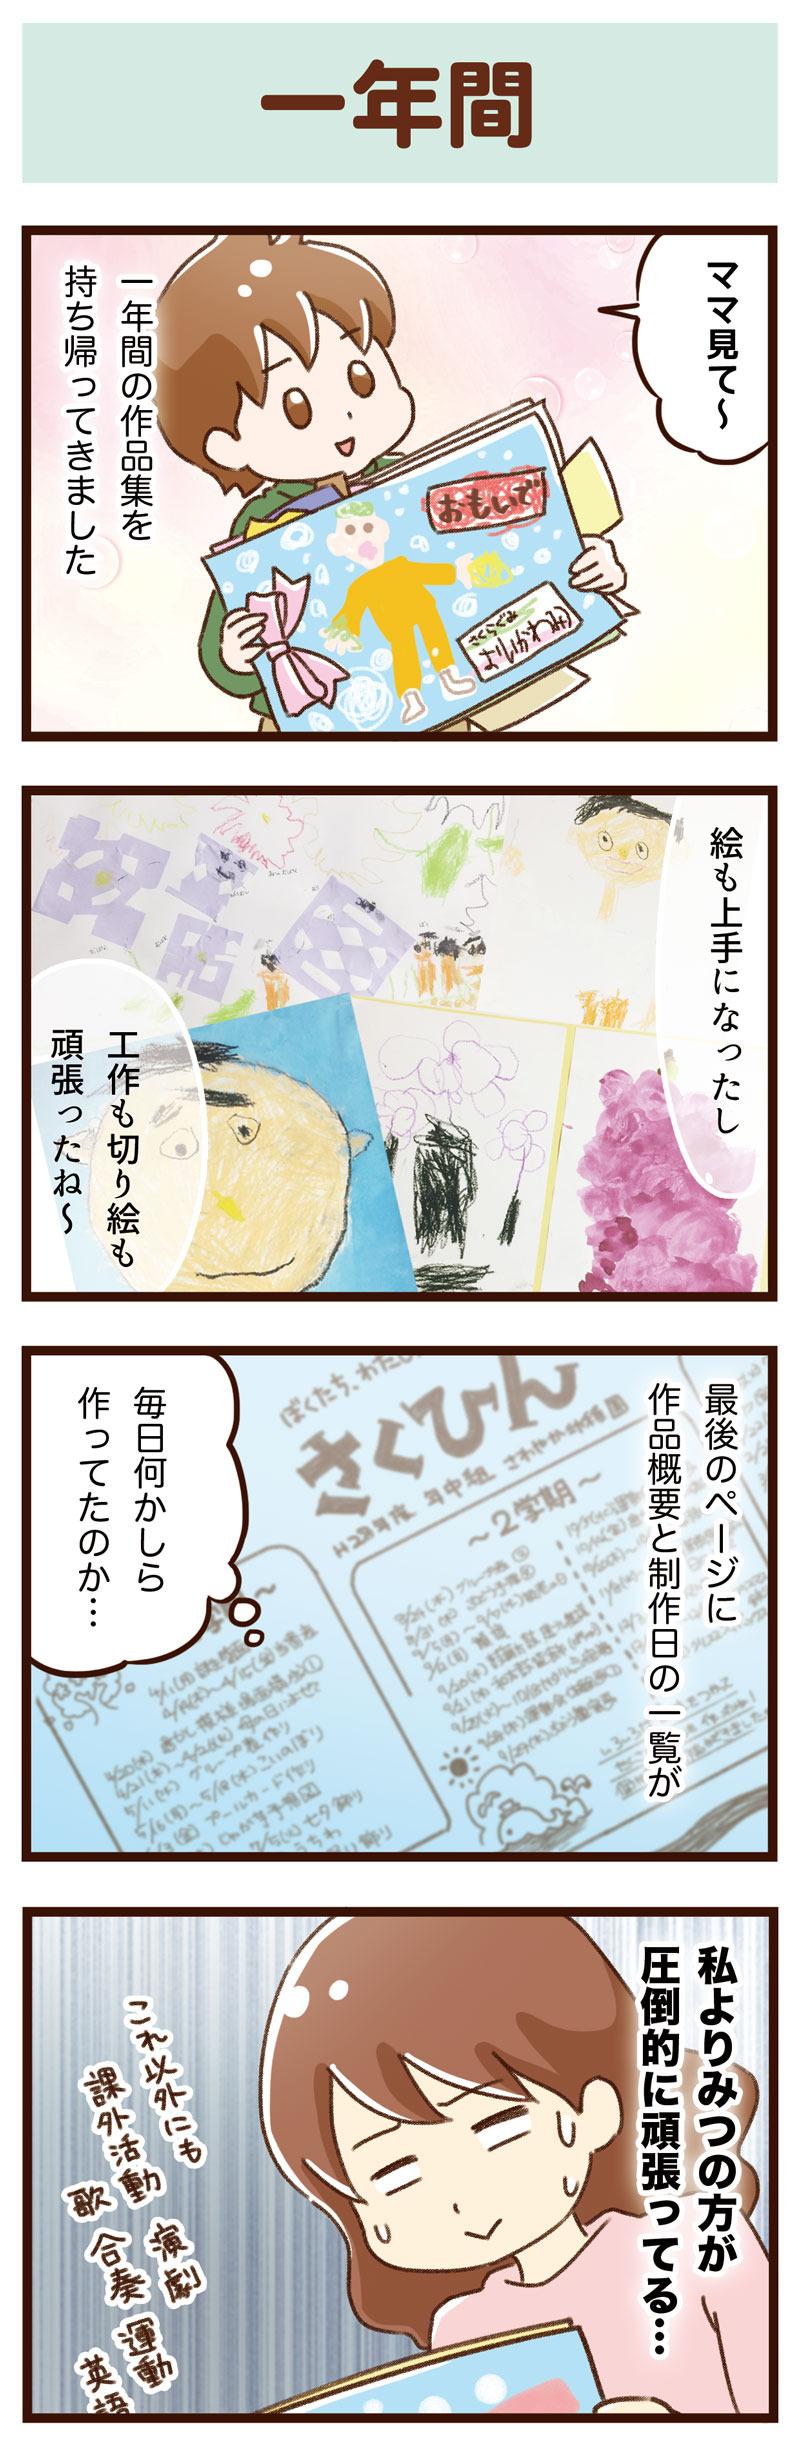 yumui270-1